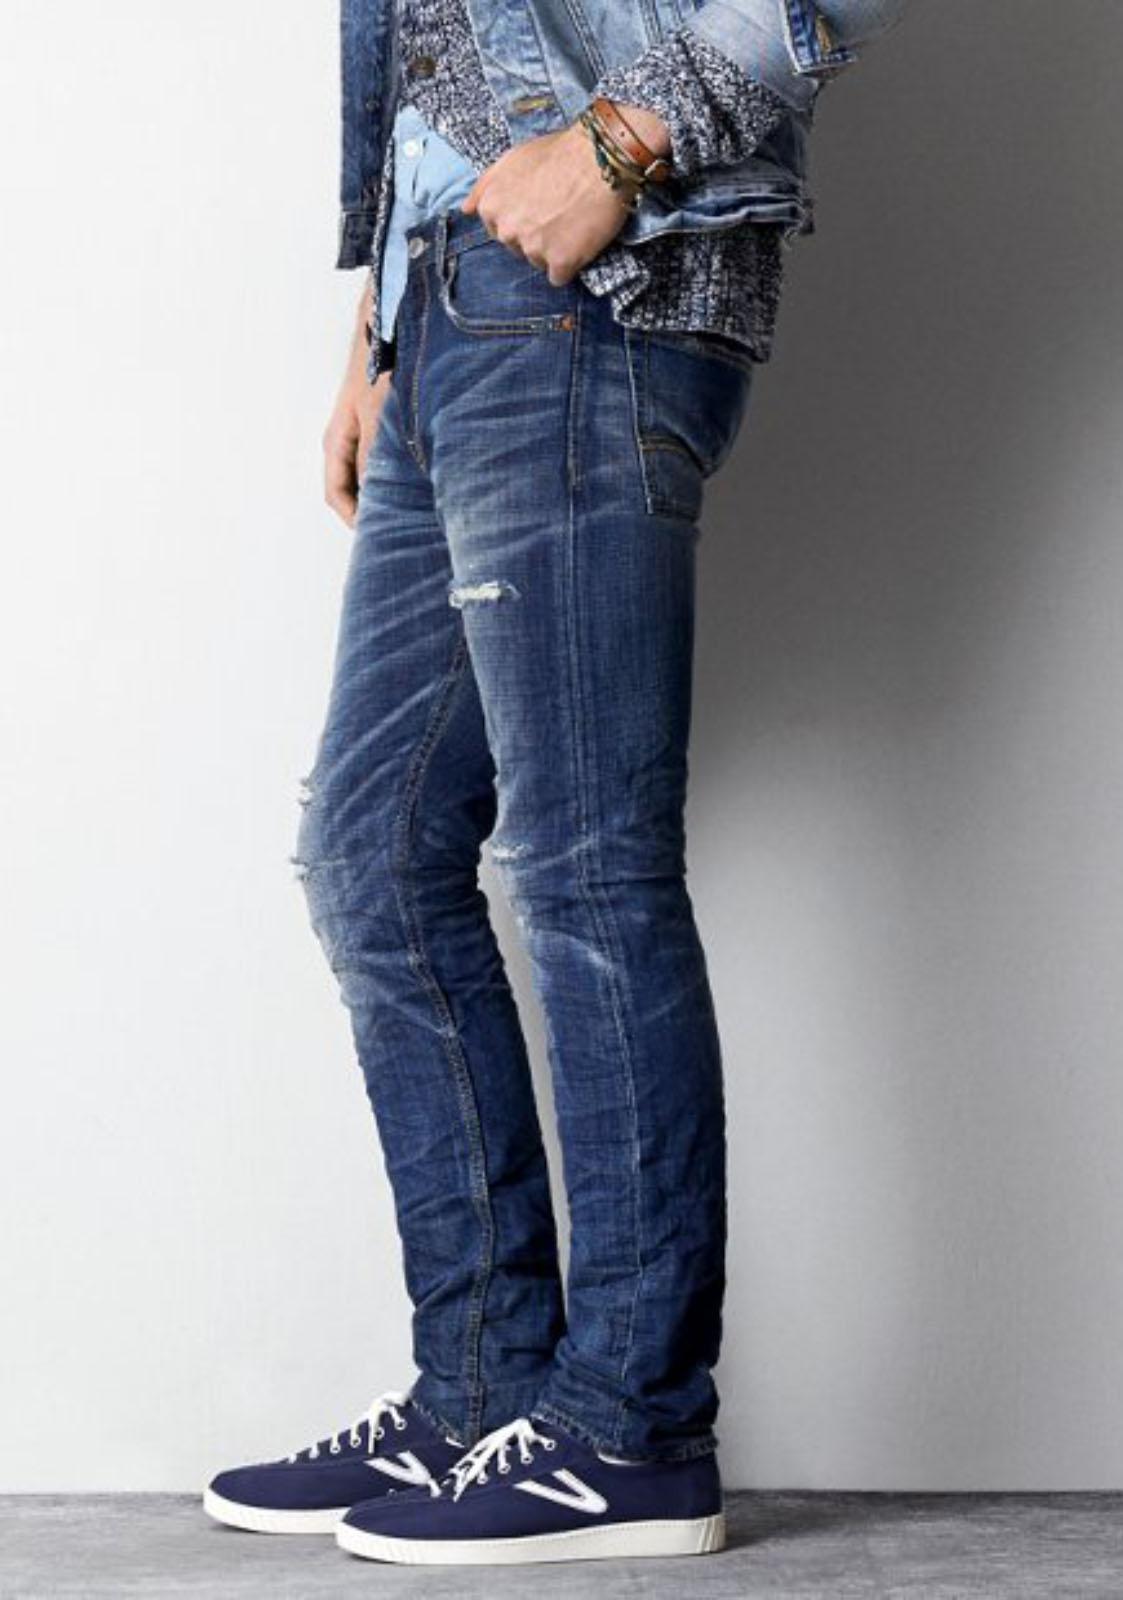 custom jeans lightbox bptnswi